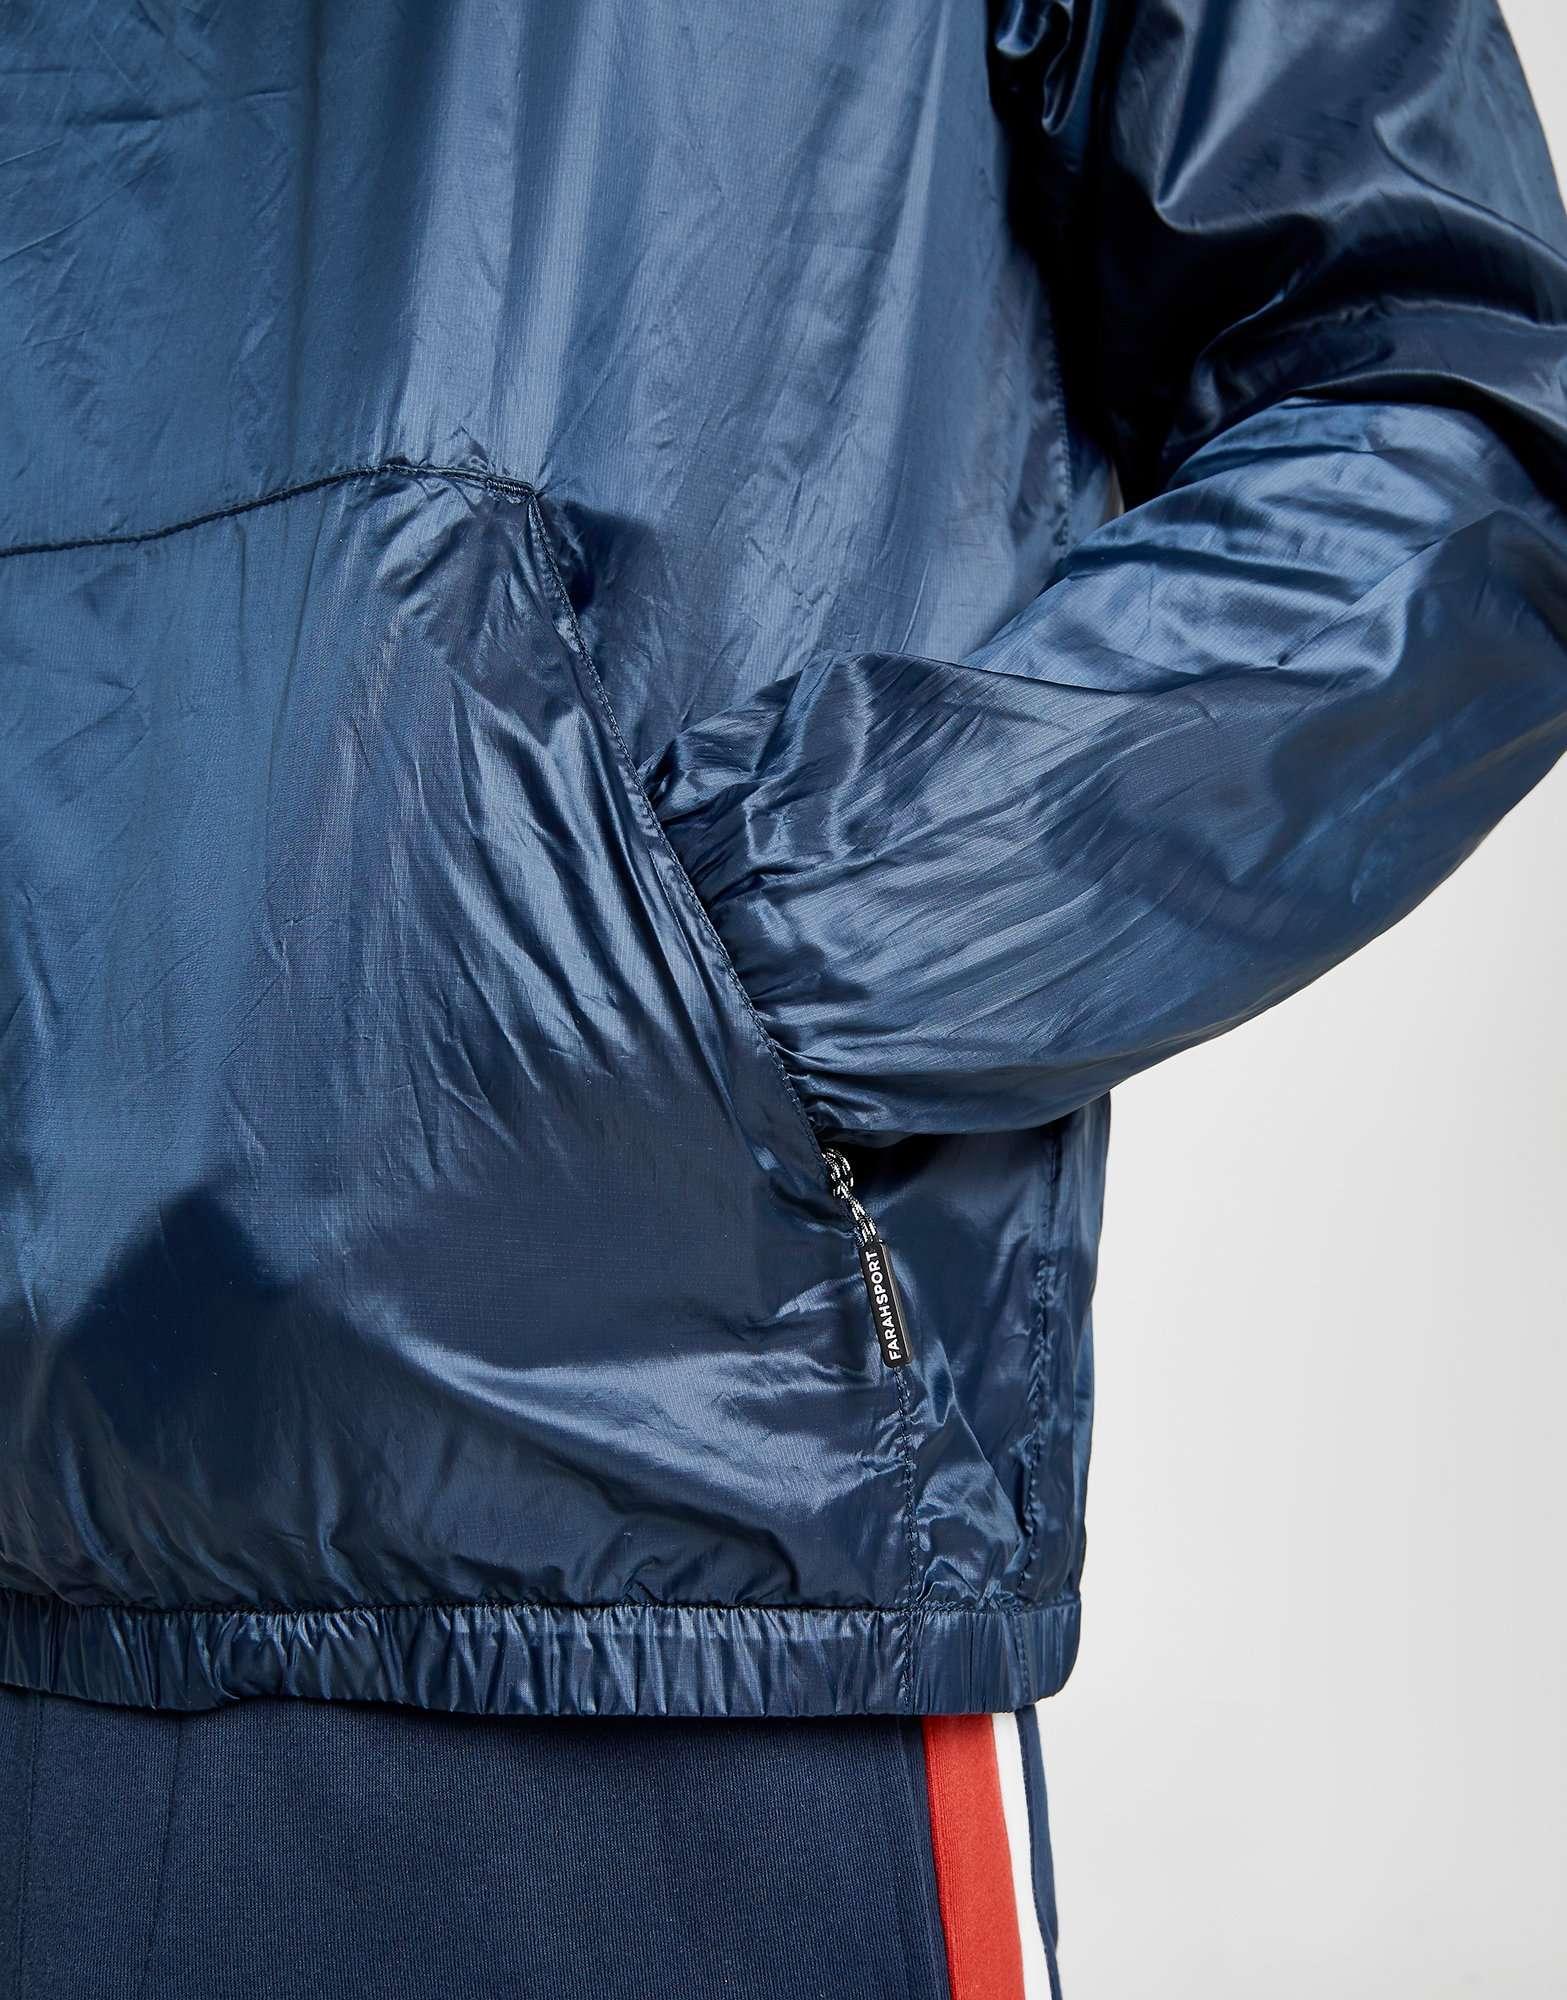 Farah Linwood 1/4 Zip Jacket